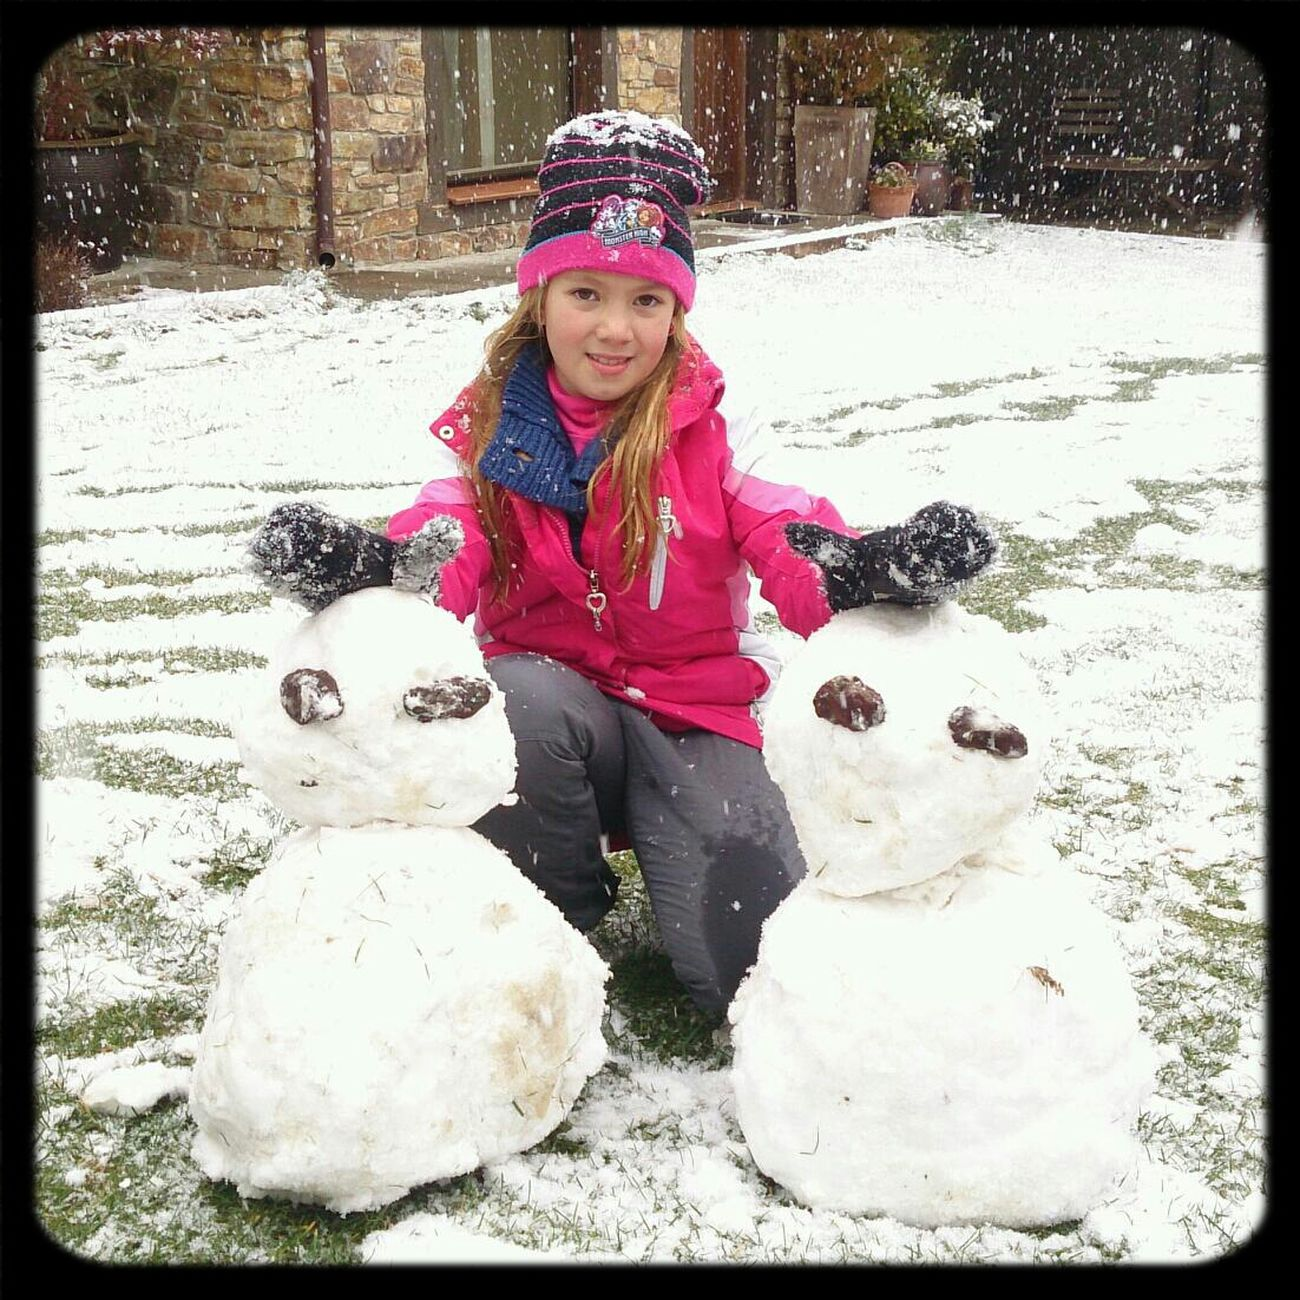 En La Nieve! Madrid Nieve. Snowman⛄ Making A Snowman